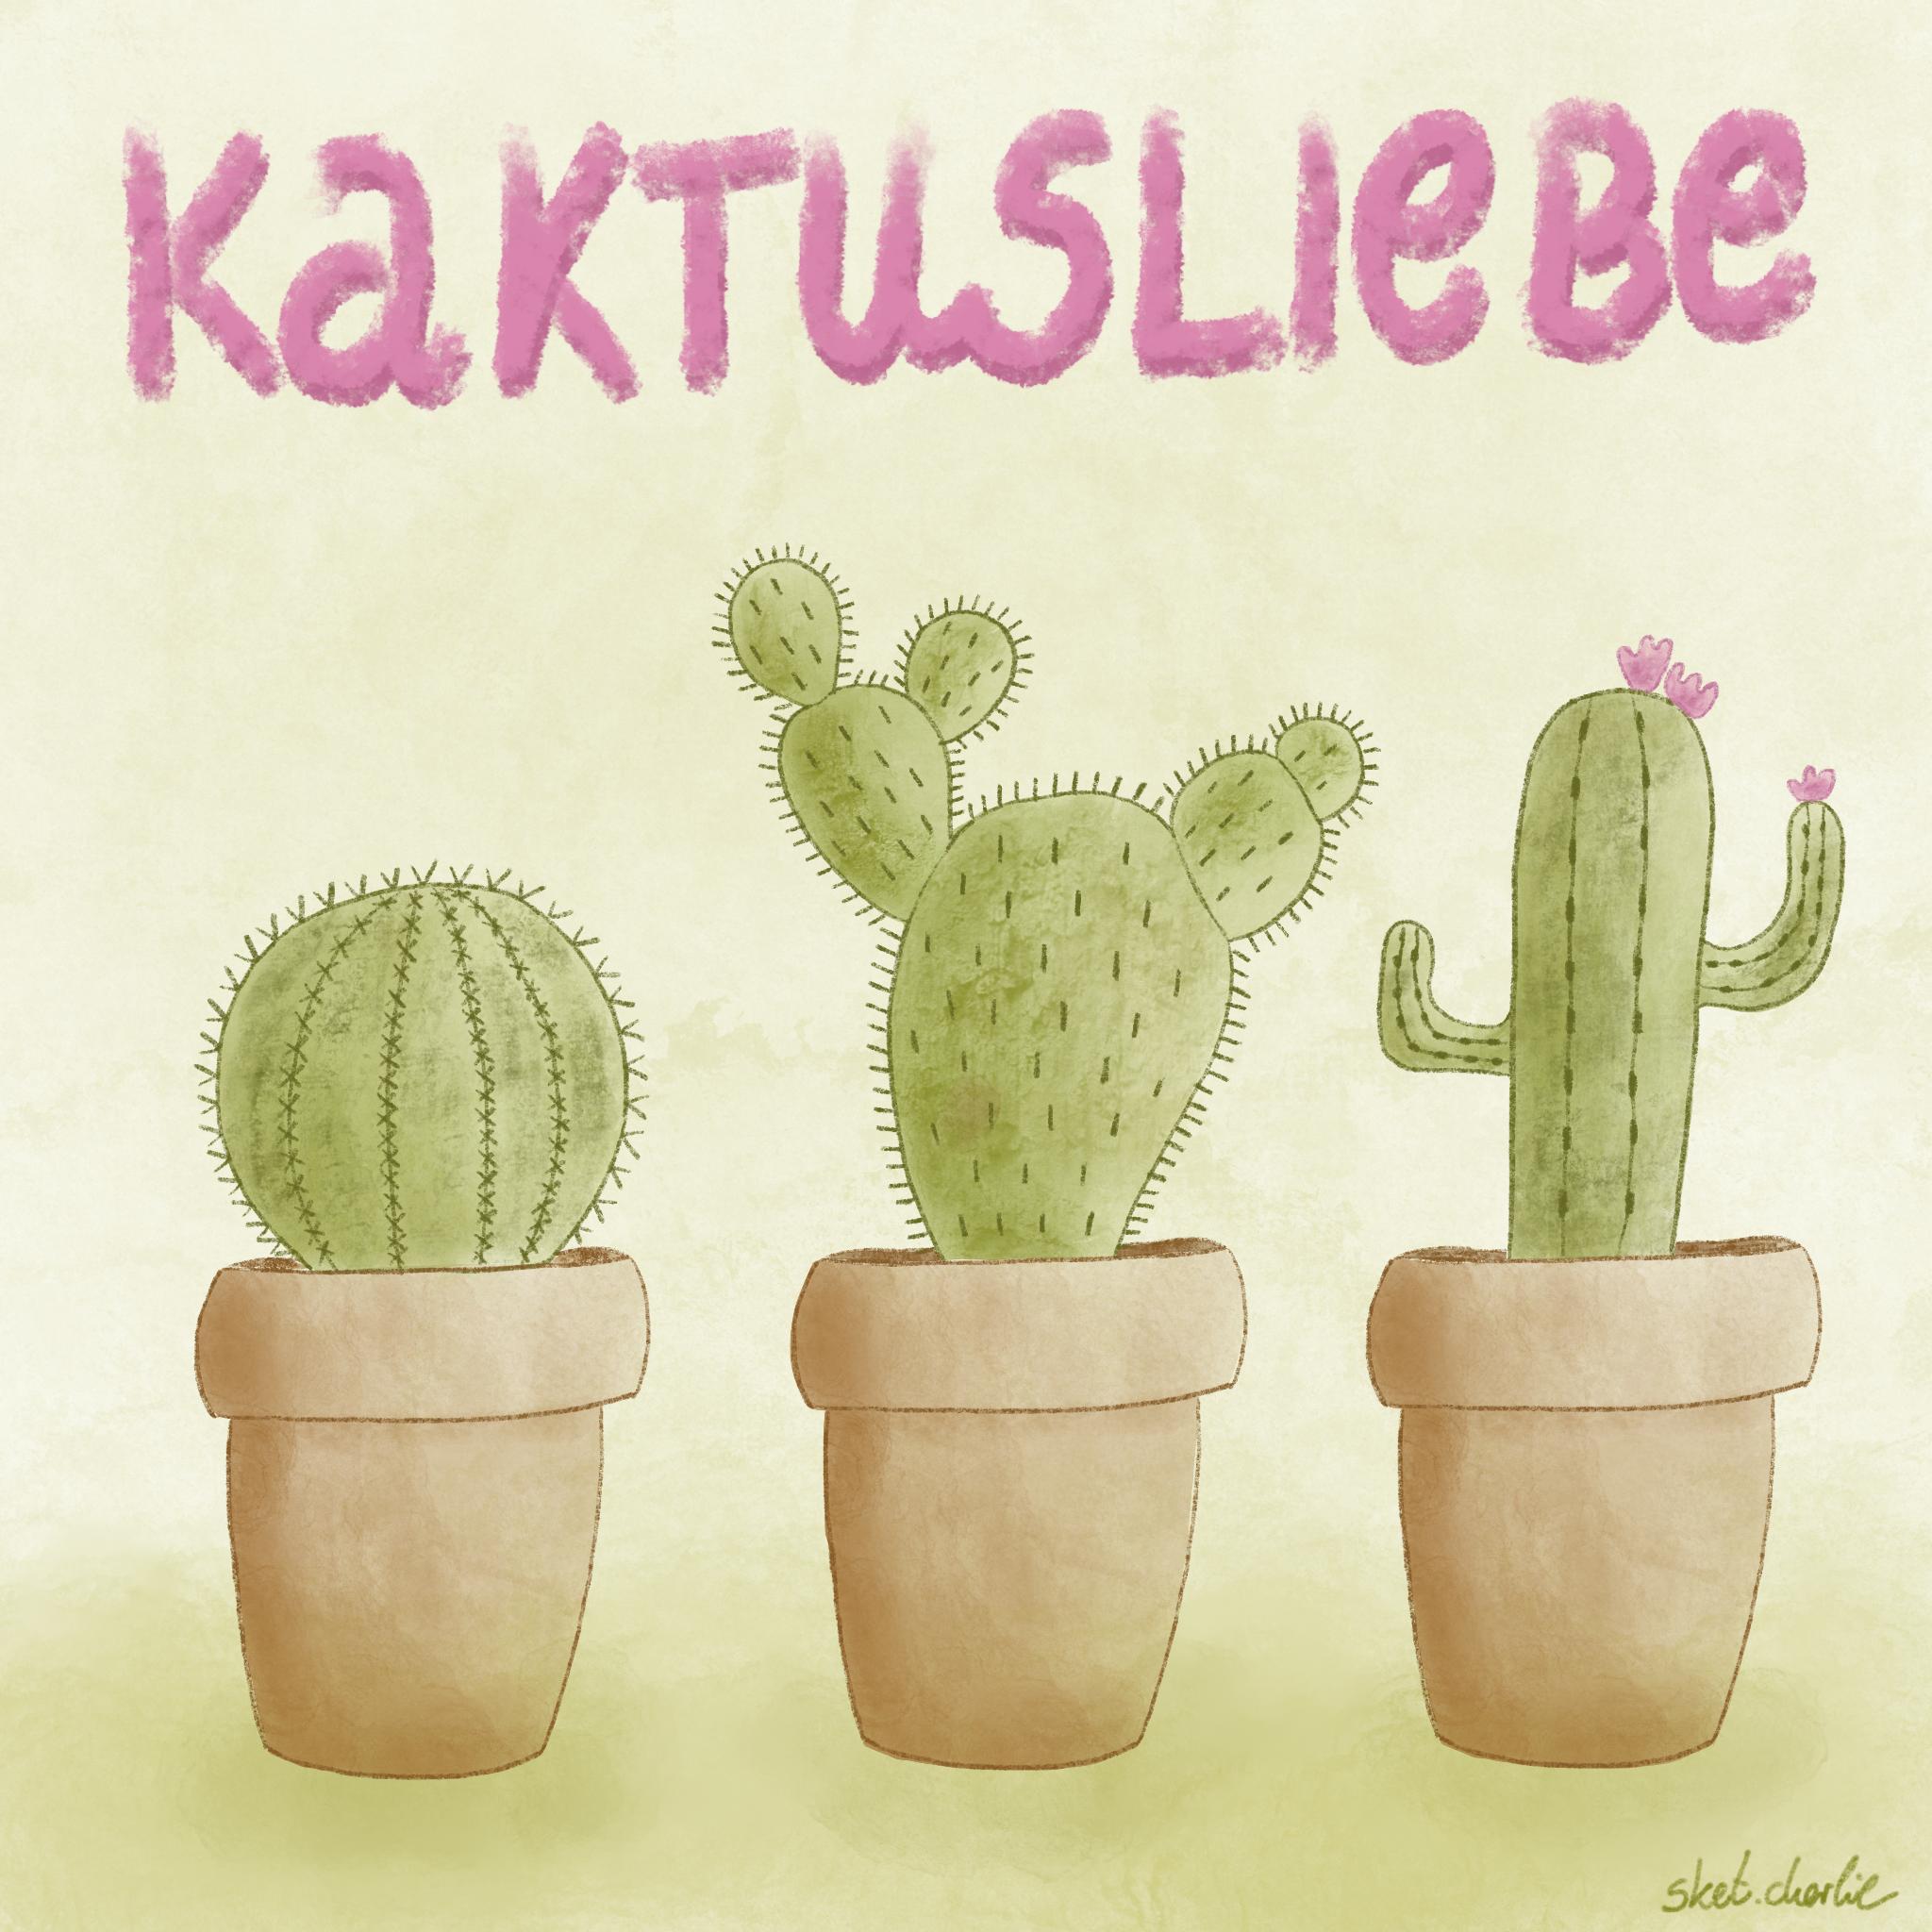 Kaktusliebe